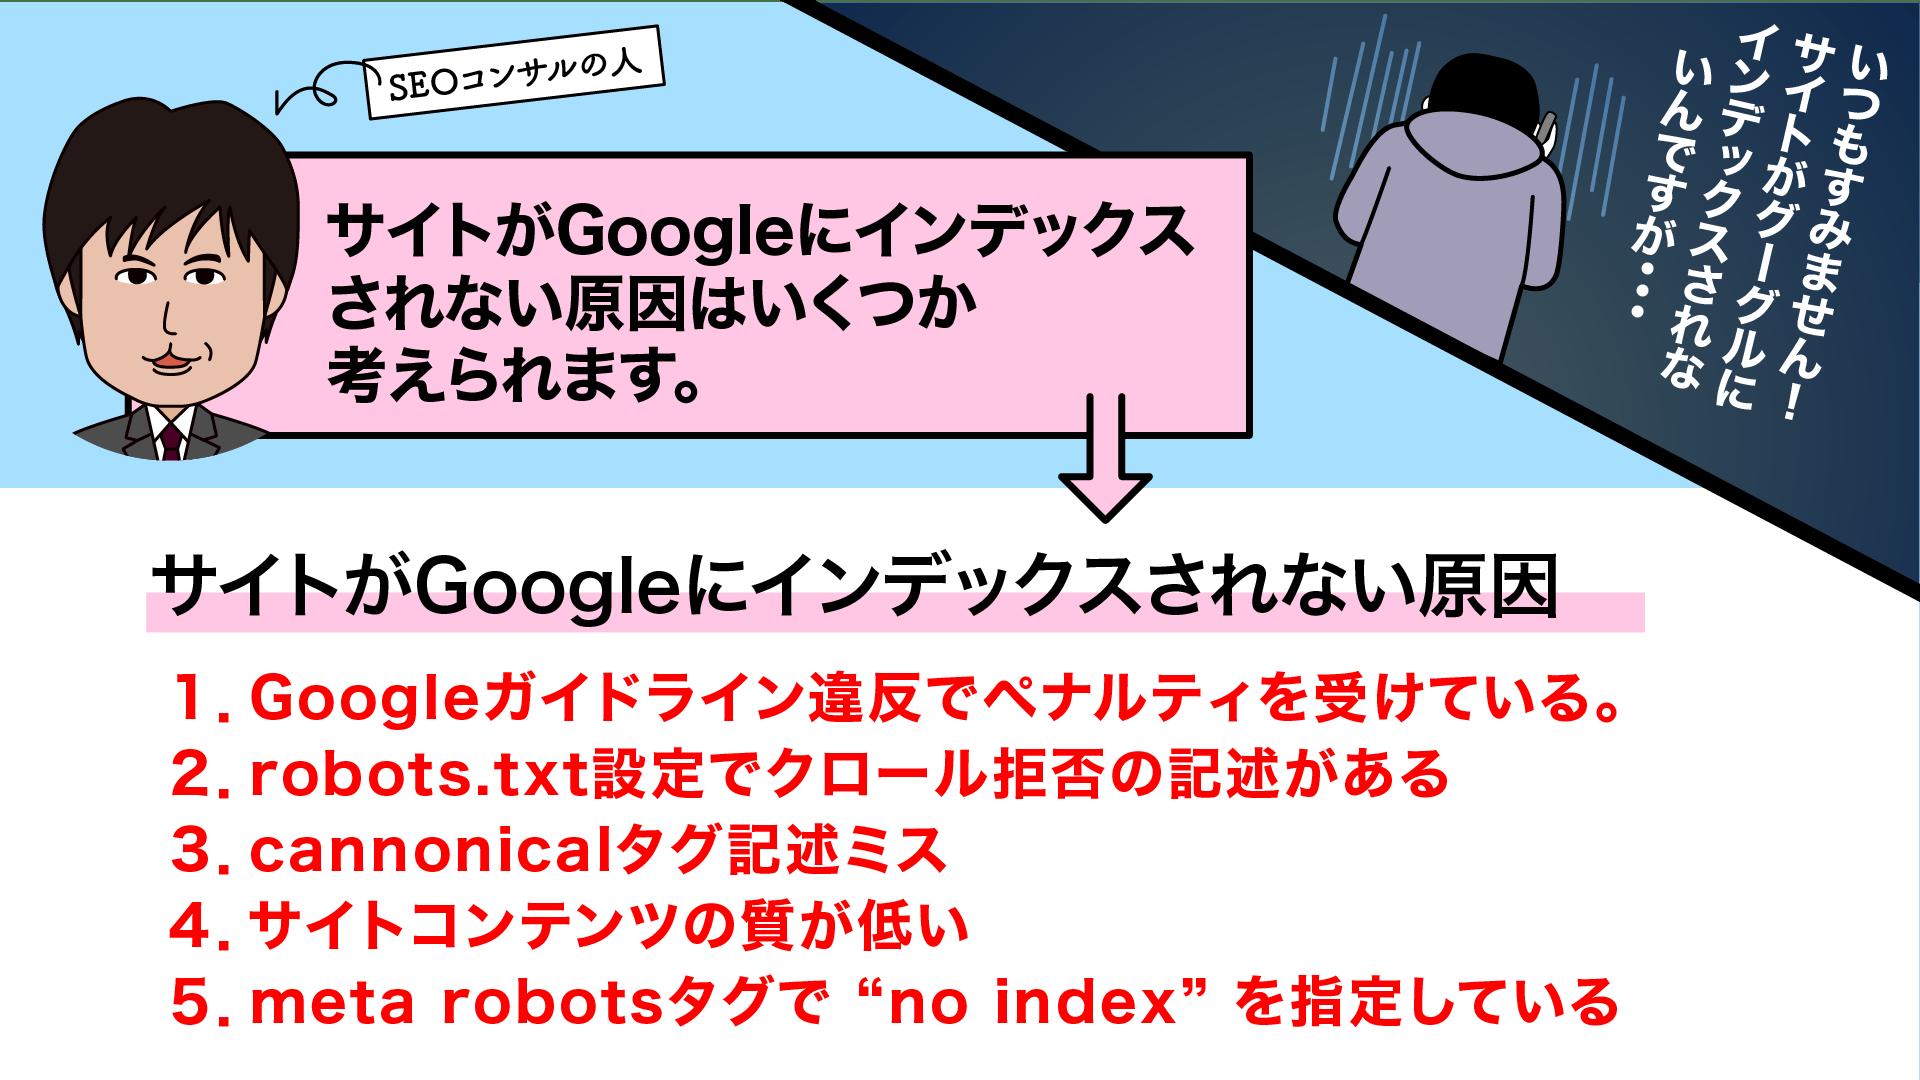 SEO対策漫画ーNOINDEXに気を付けろ④